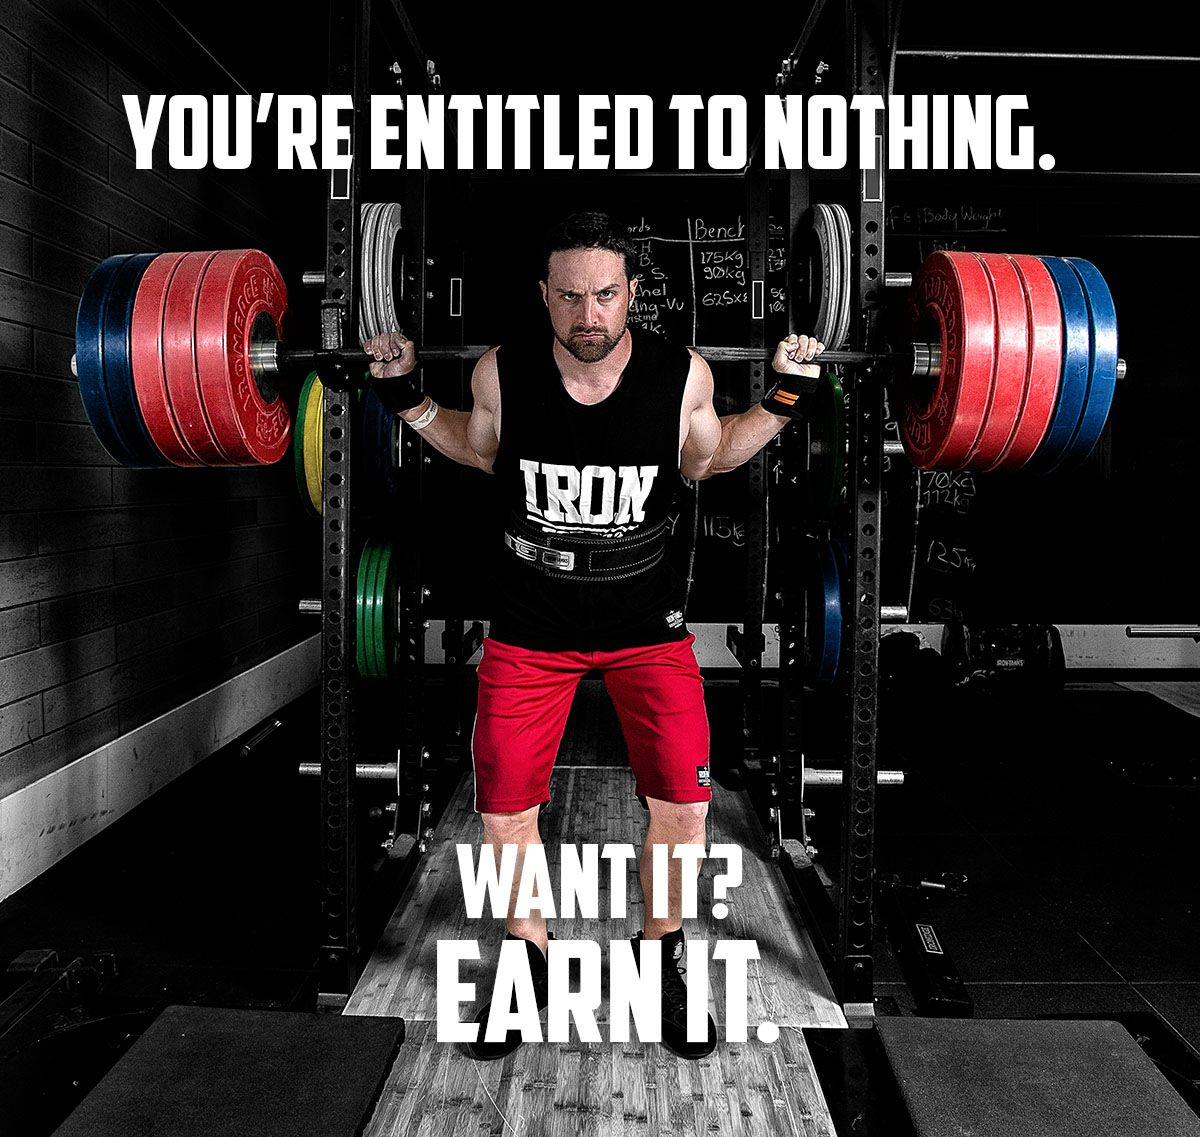 True Grit Always Reigns Supreme Want It Earn It Philosophy Via Layne Norton Irontanksgymgear Com Built Iron Gym Gear Fitness Motivation Layne Norton